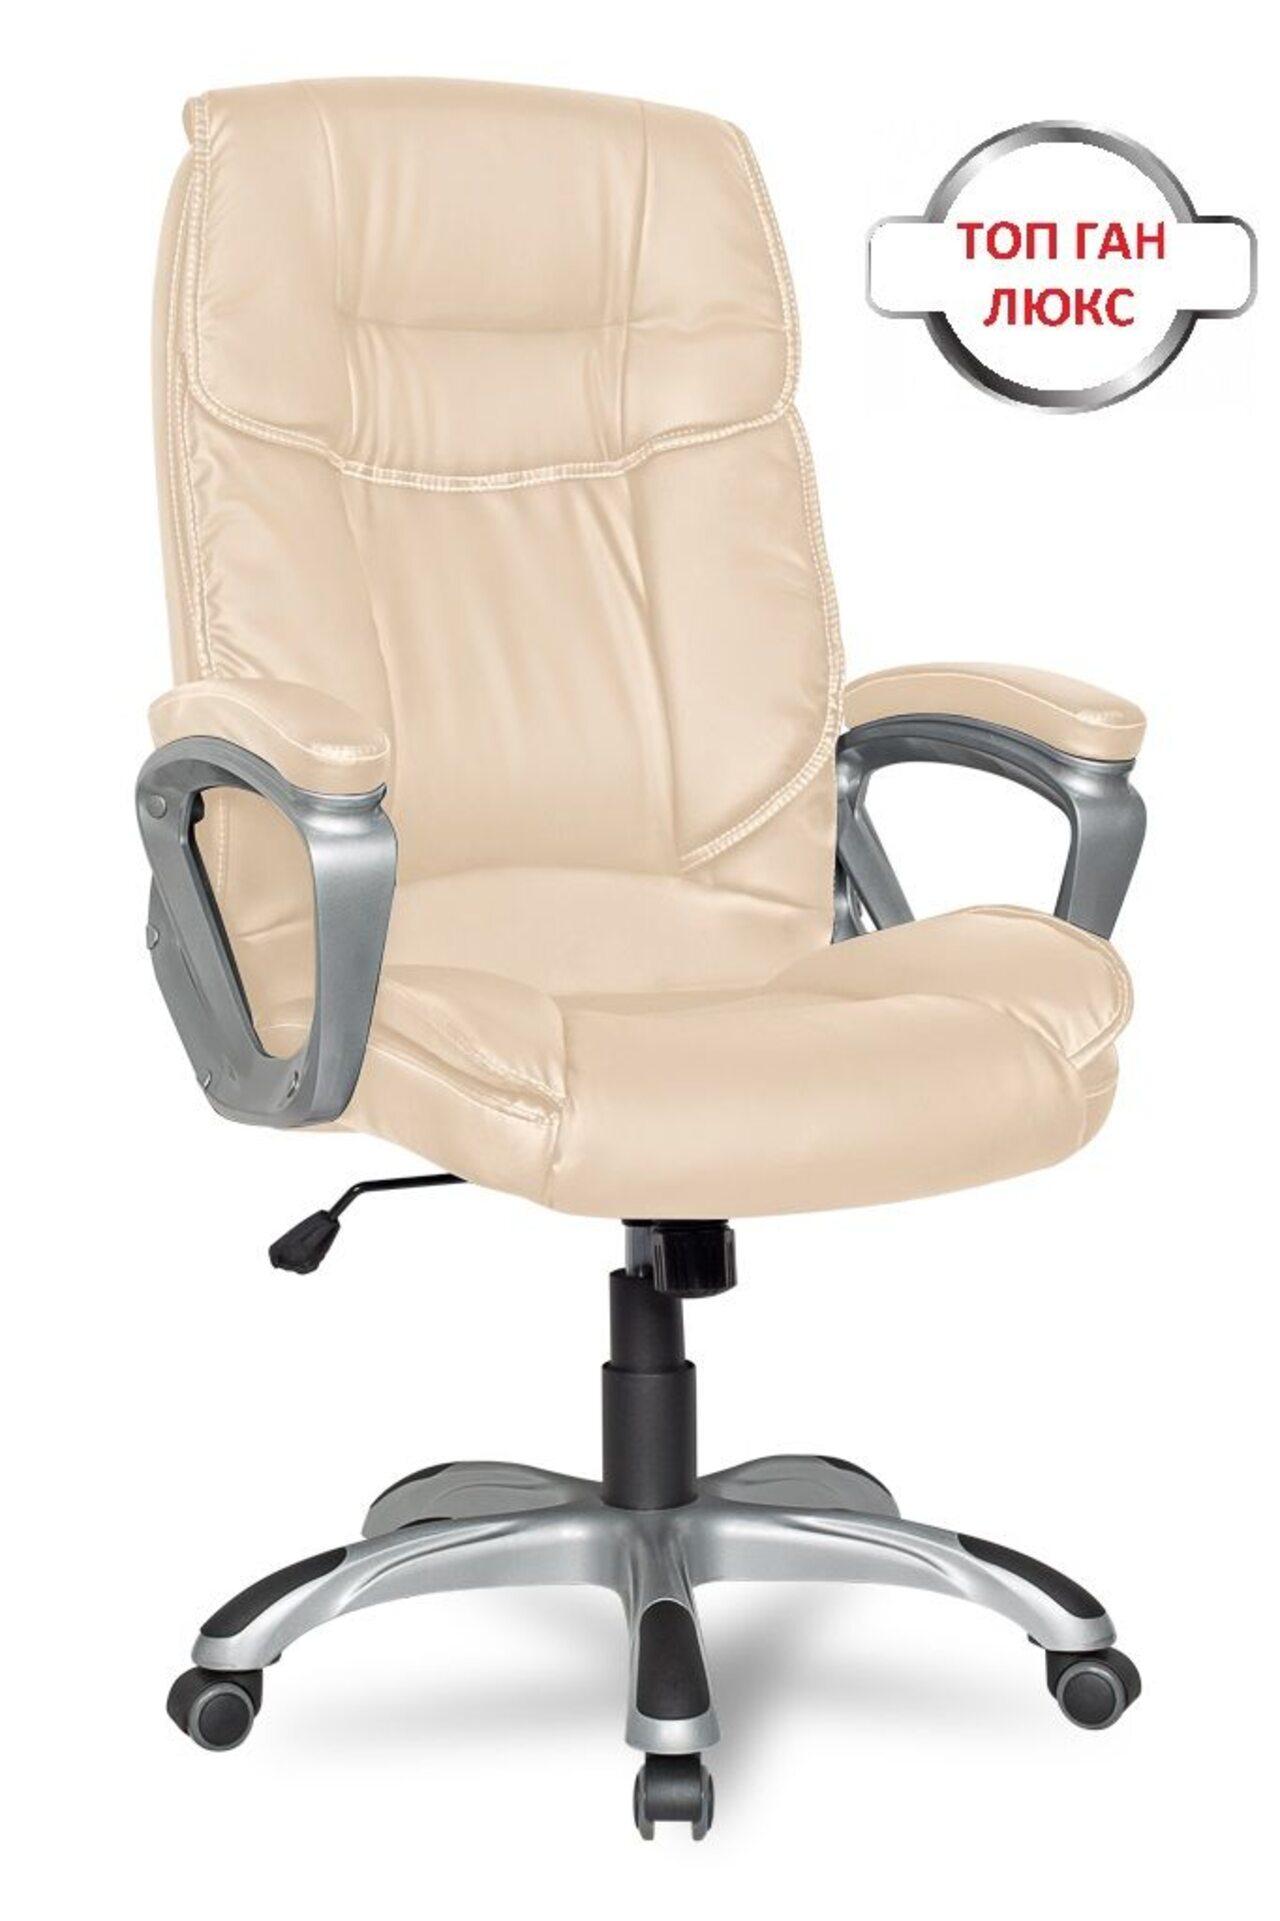 Кресло руководителя College CLG-615 LXH - фото 1